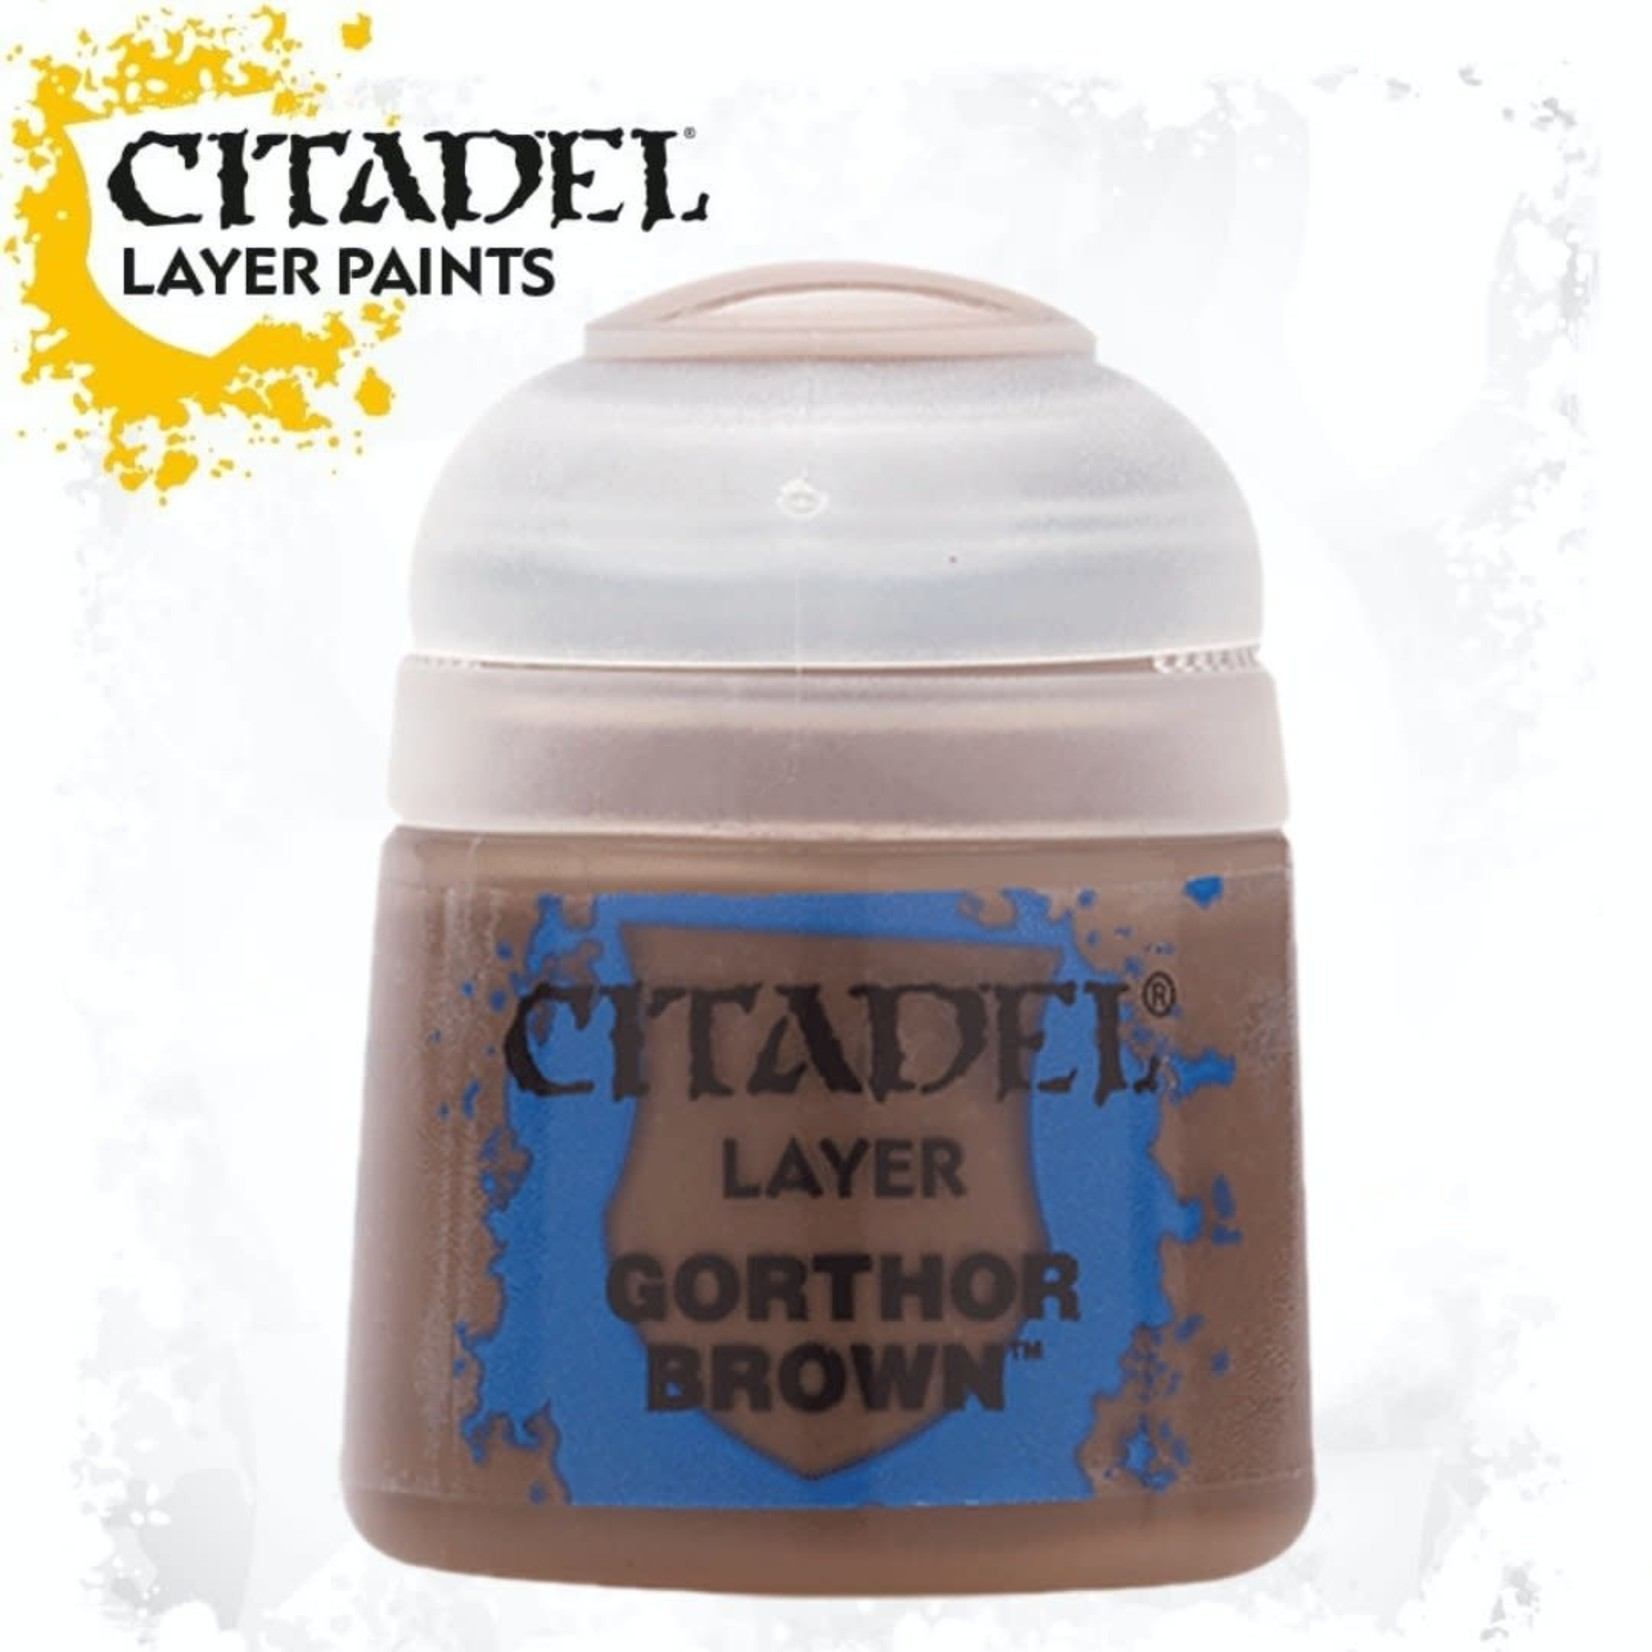 Citadel Citadel Paint - Layer: Gorthor Brown